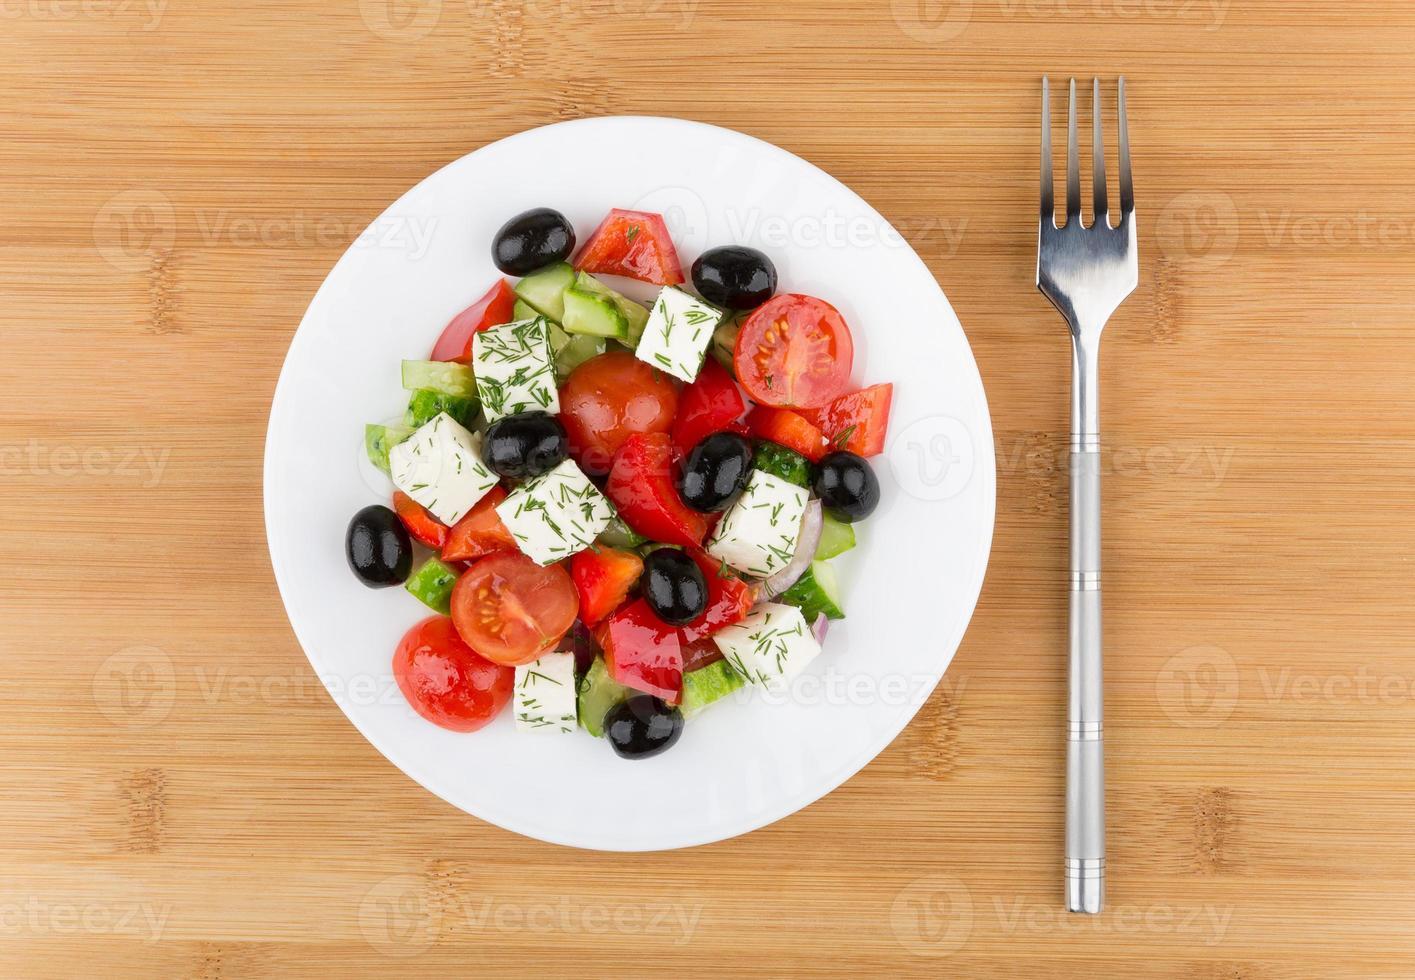 prato de vidro com salada grega e garfo na mesa de bambu foto